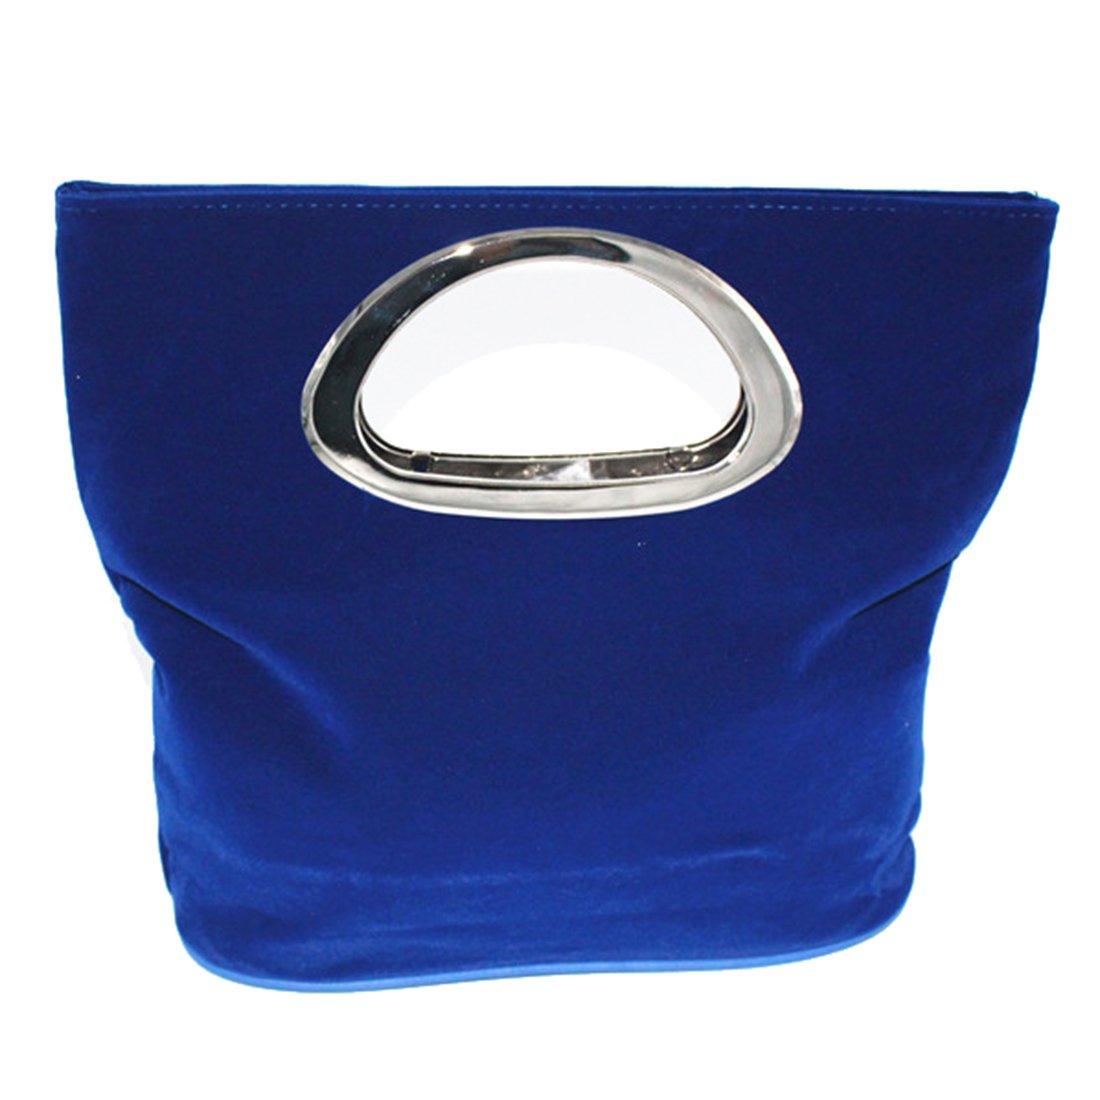 Women Suede Clutch Evening Purse Handbag Cocktail Wedding Prom Party Handle Bag (Blue)